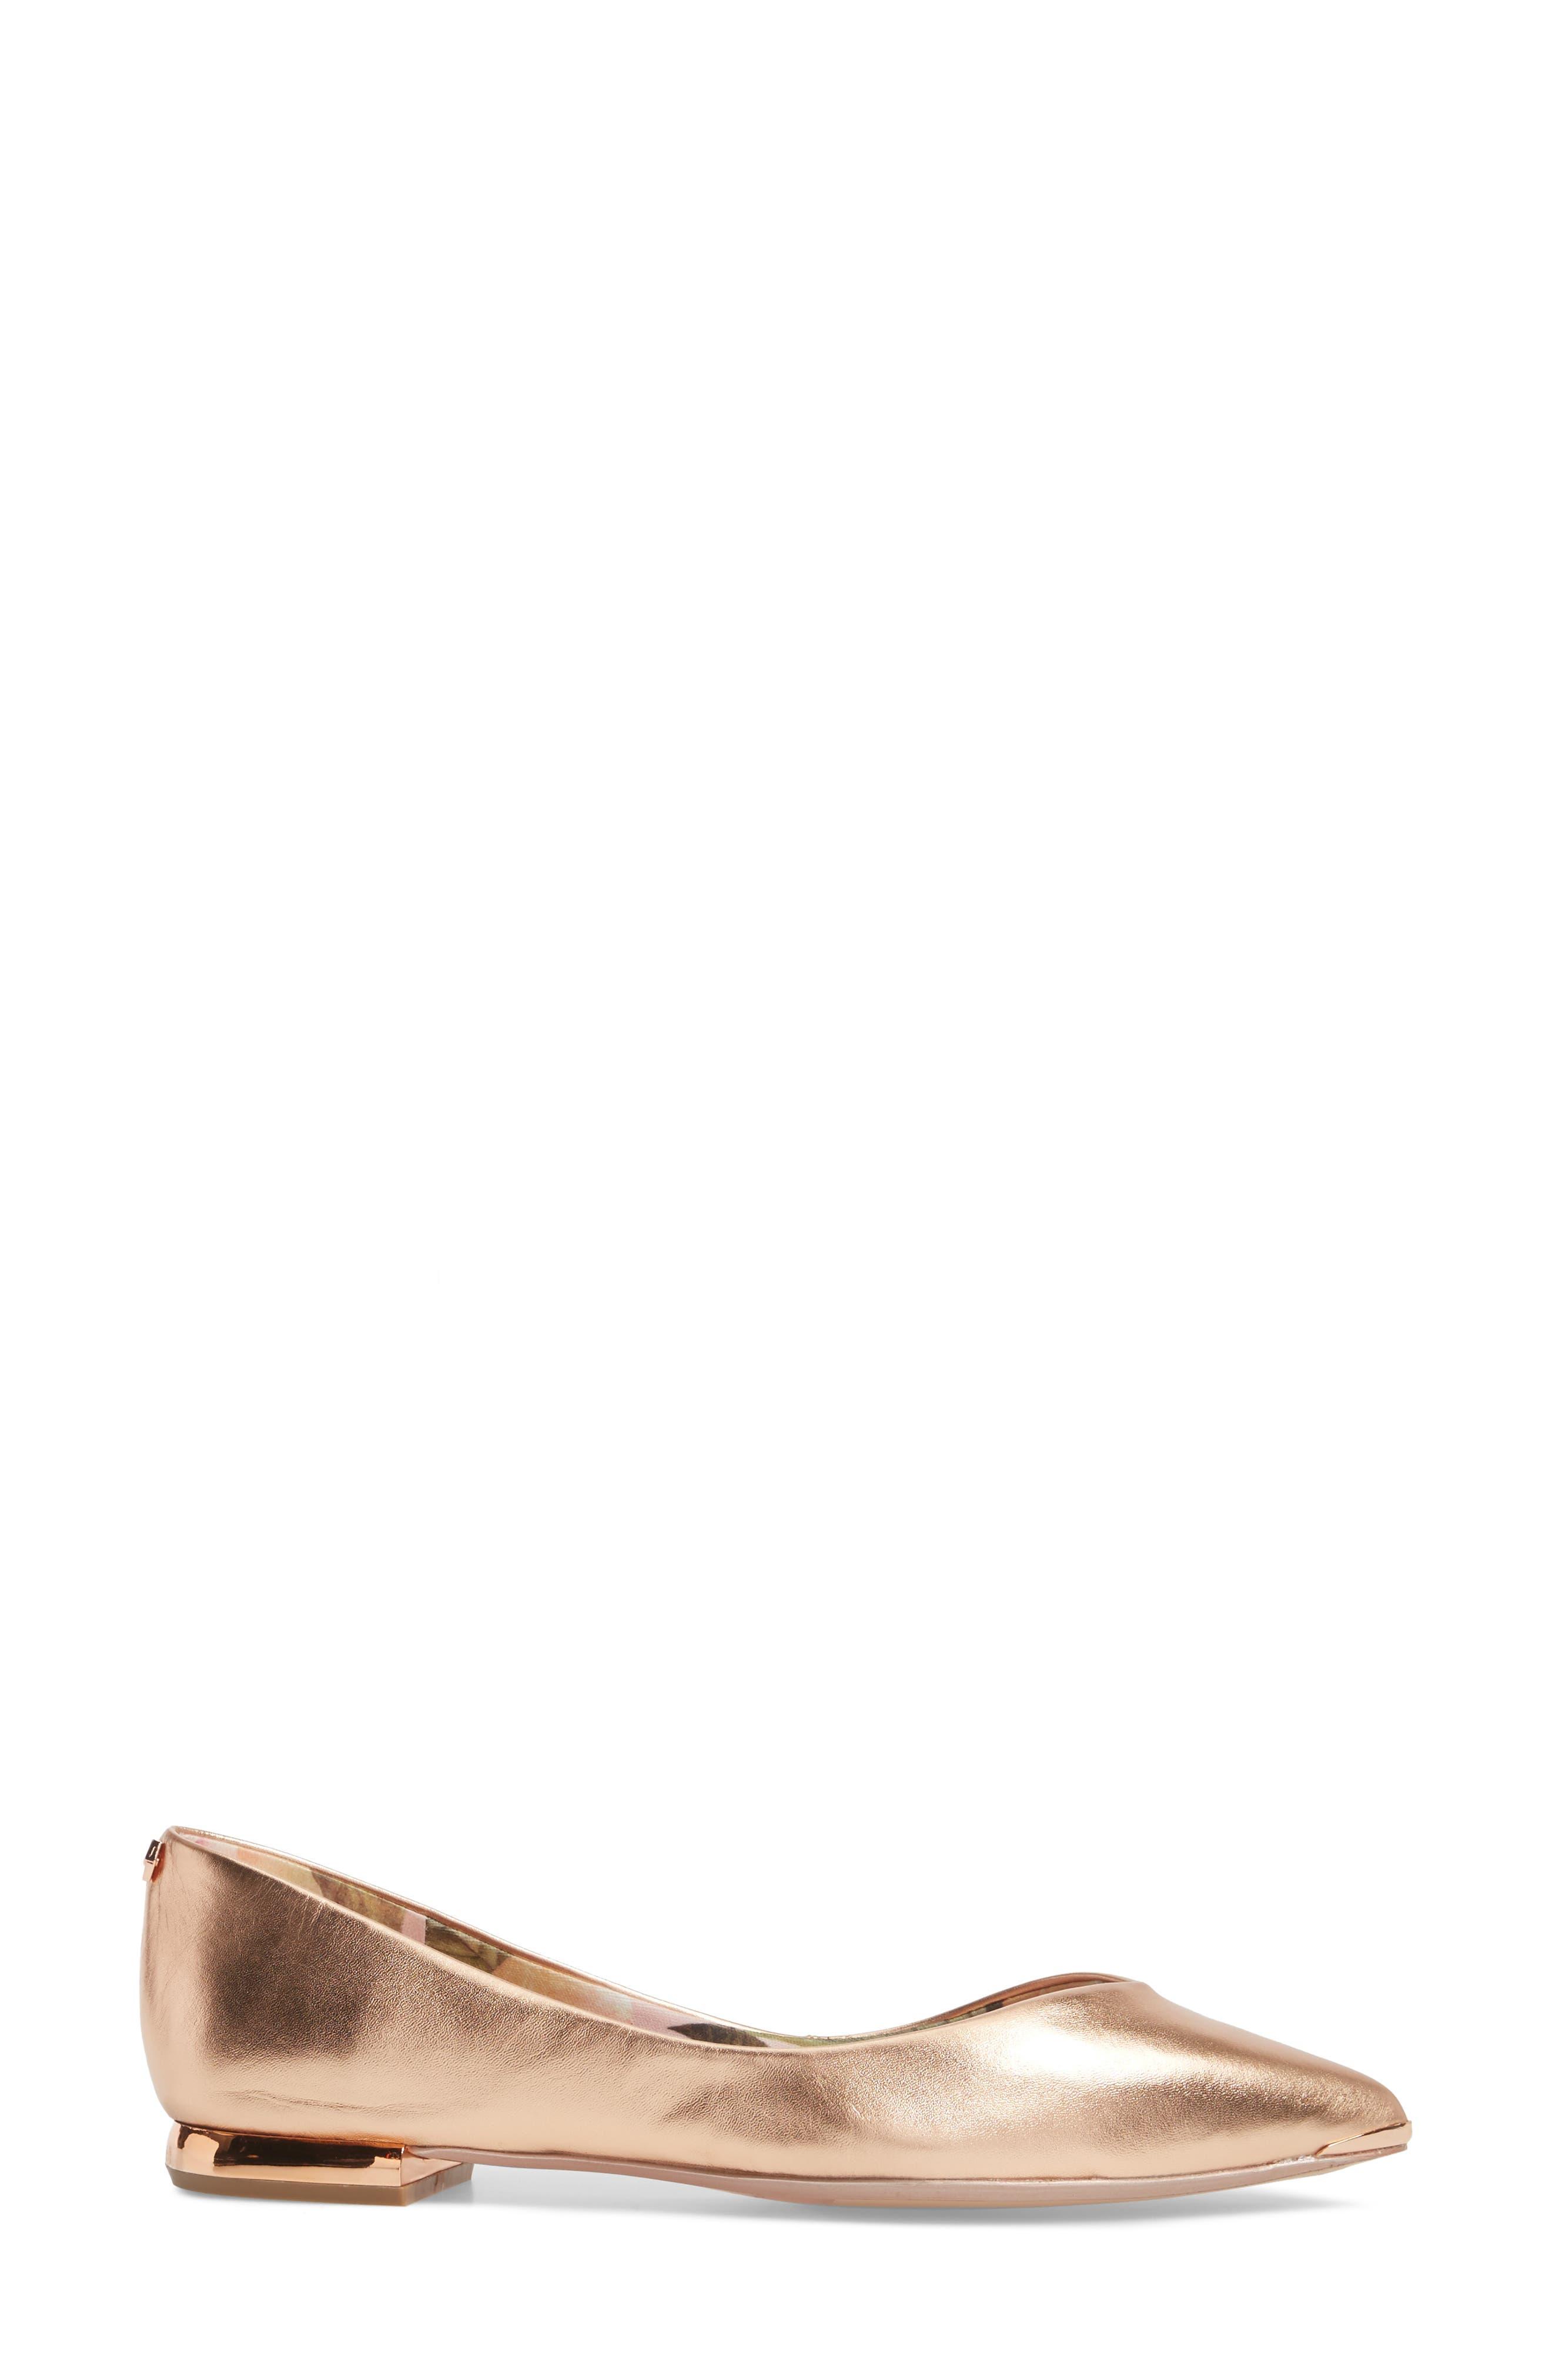 Grasce Flat,                             Alternate thumbnail 3, color,                             ROSE GOLD LEATHER